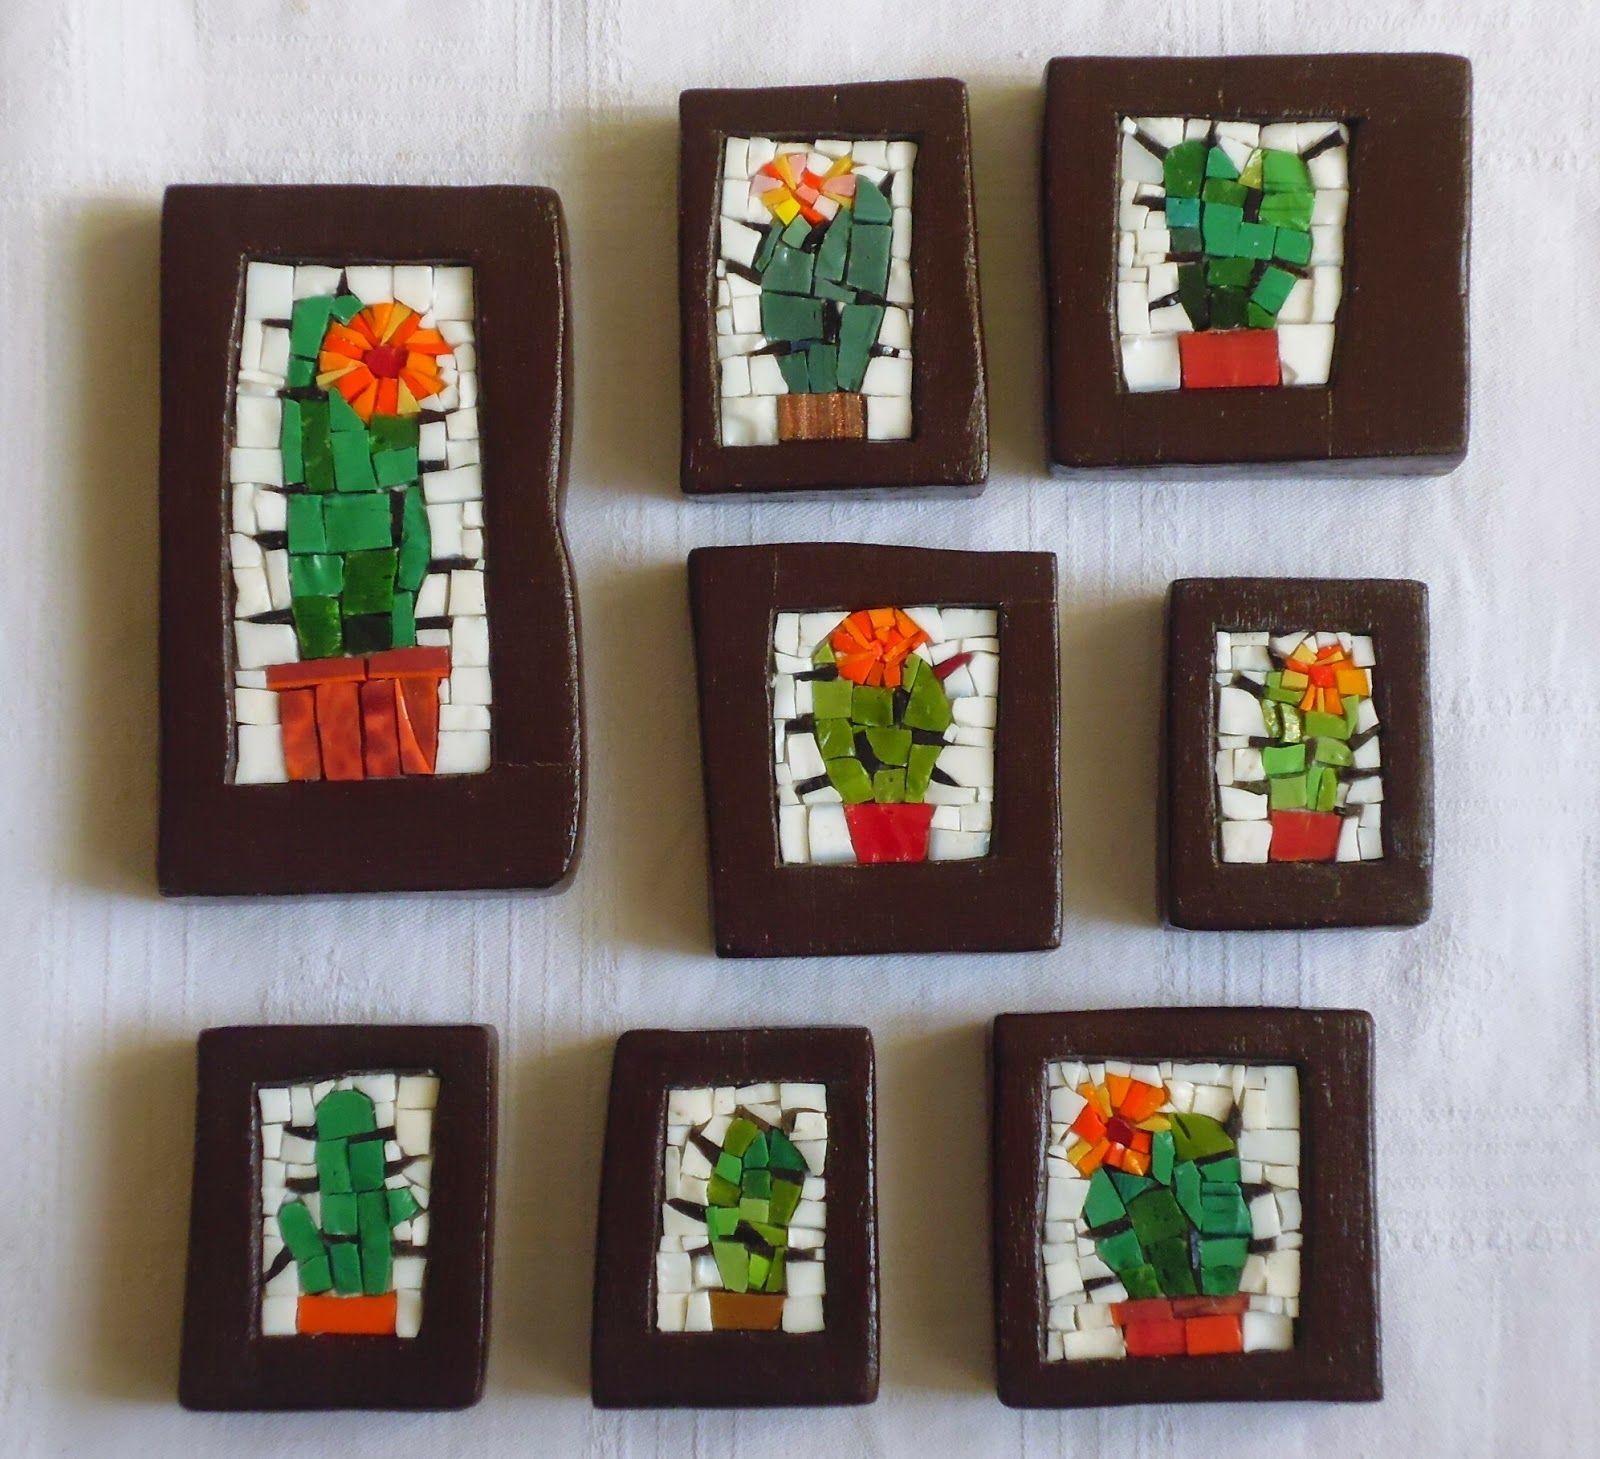 IN ARTE HASHIMOTO: I love cactus